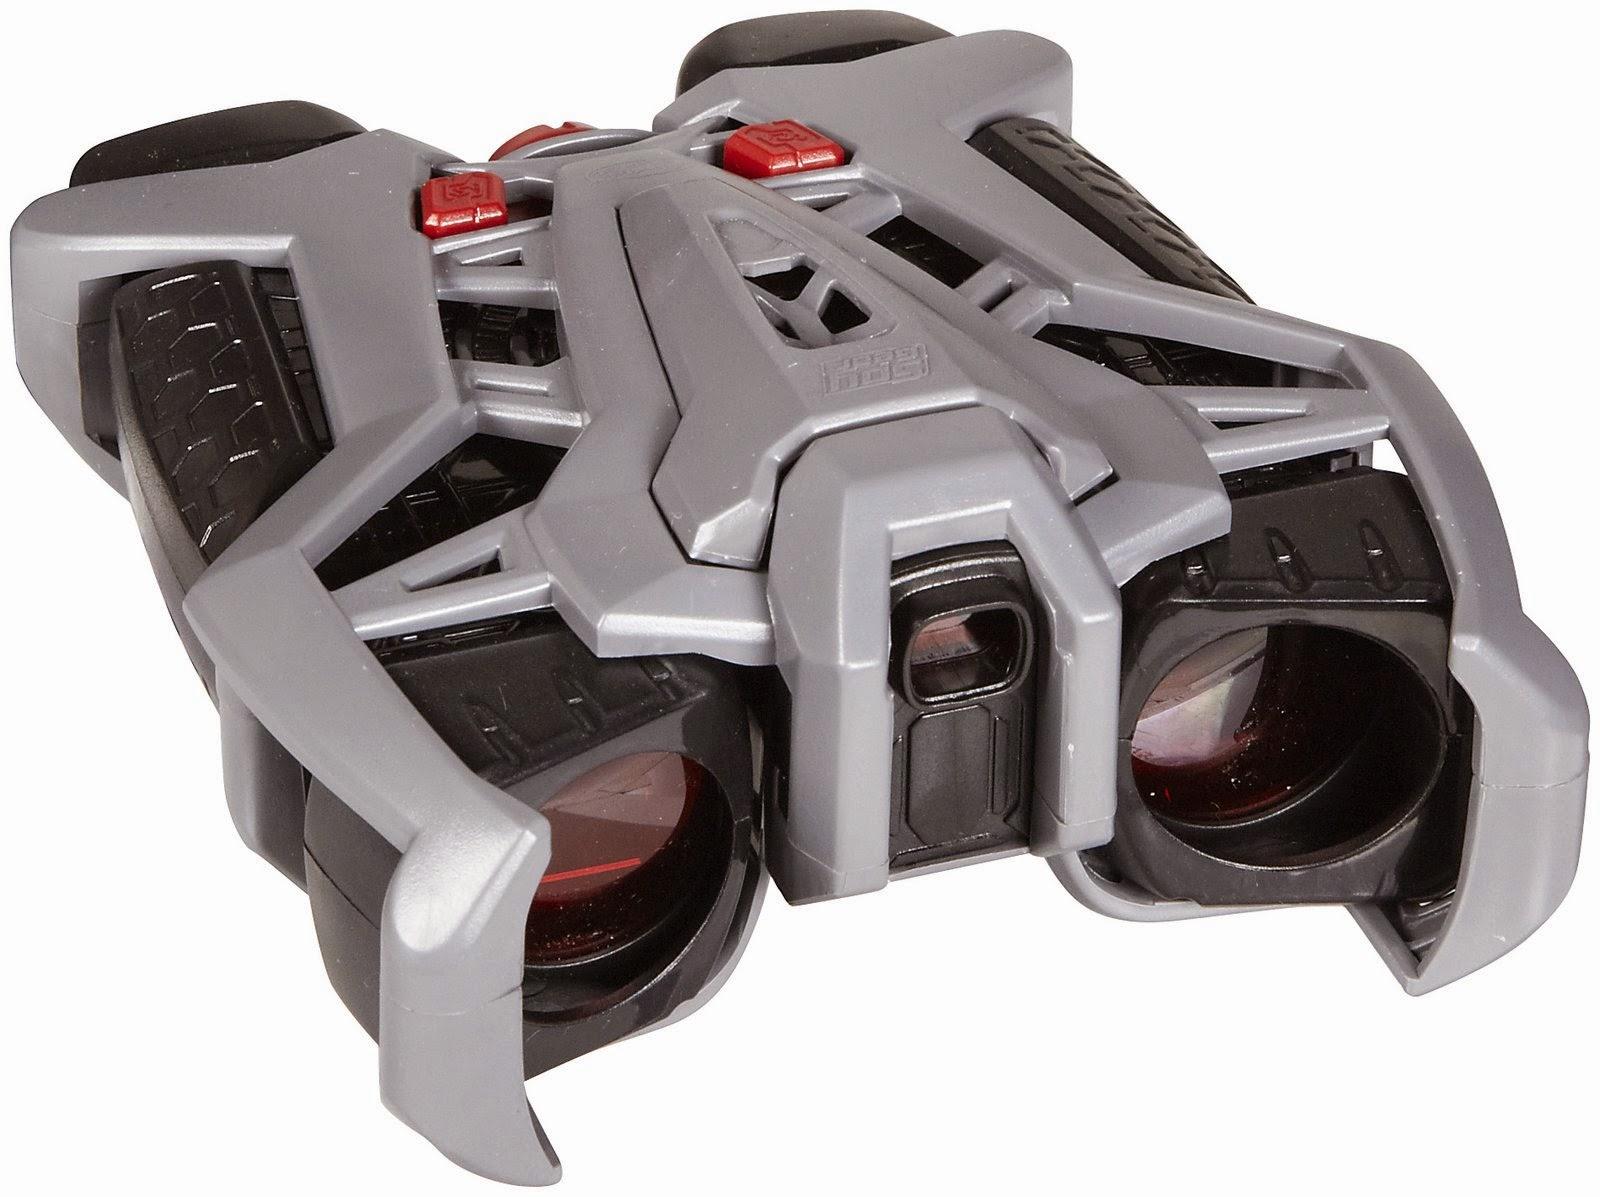 spy gadgets binoculars form